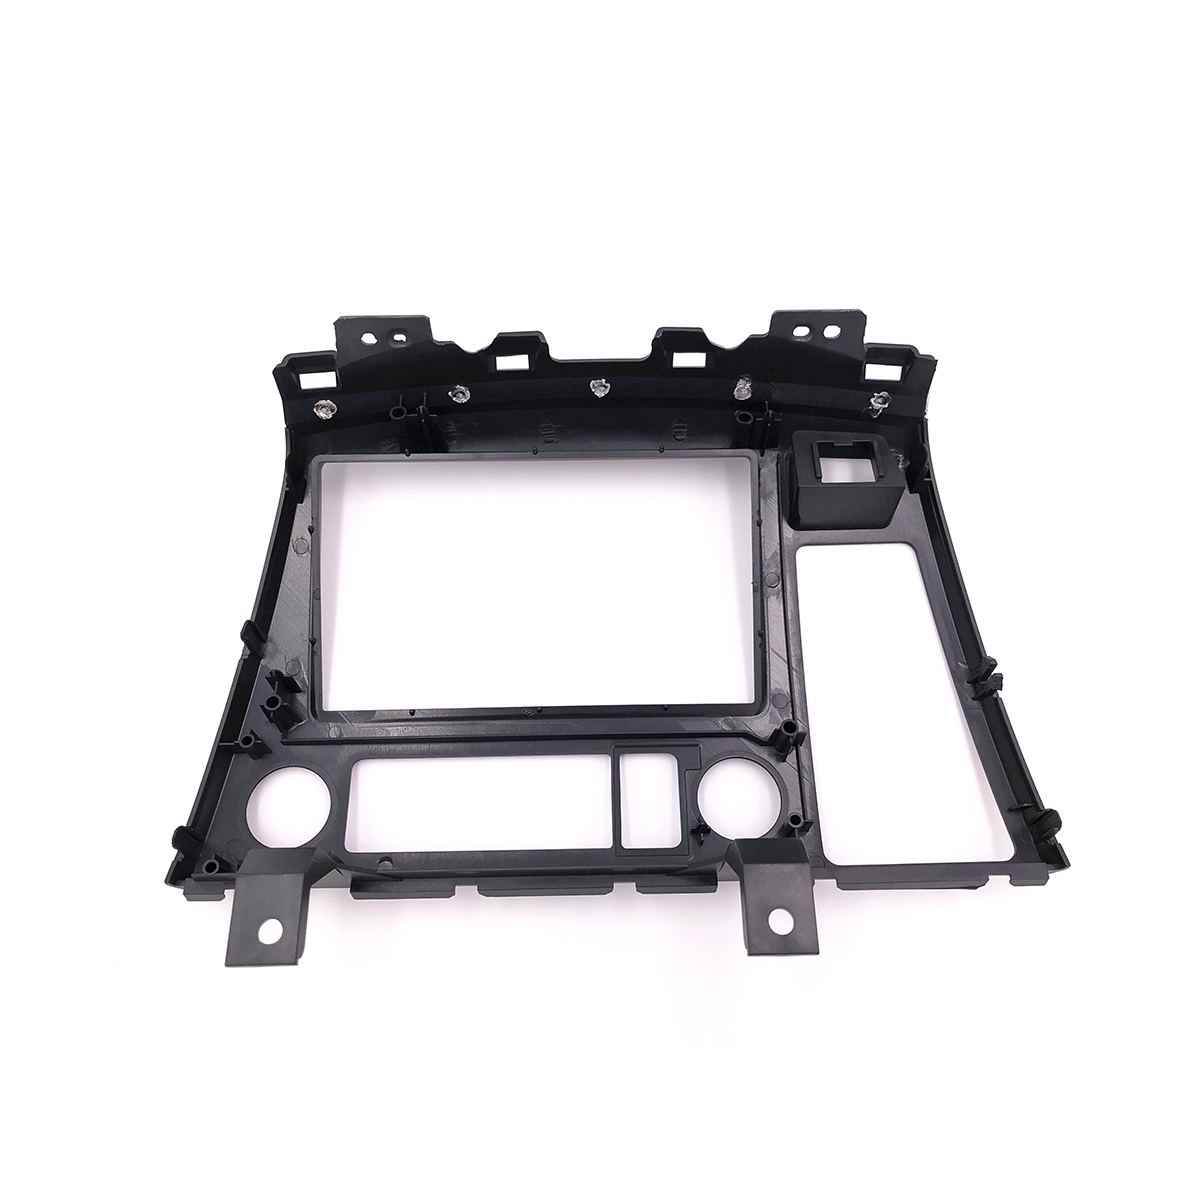 25*8*34 5cm Car Radio Facia Dash Kit Panel Fascia Plate For Nissan Elgrand  (E51) 2002-2010 DVD CD Panel Trim Plate Frame Console